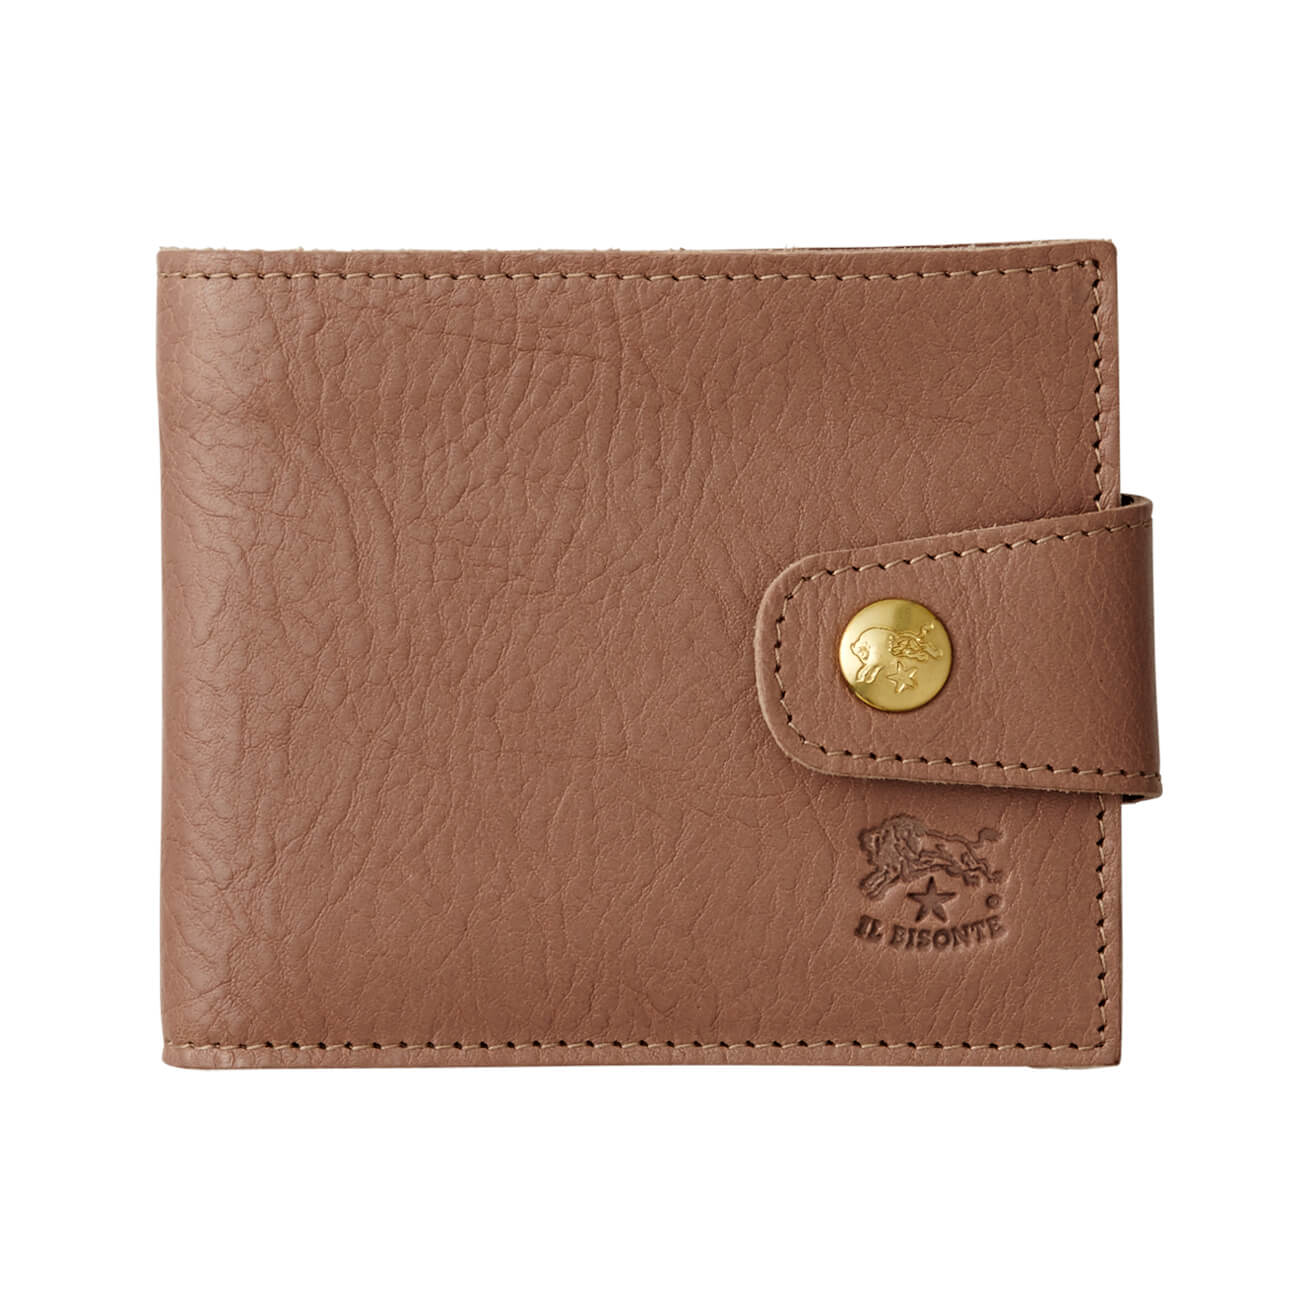 IL BISONTE (イル ビゾンテ) 日本公式オンラインストア 折財布 54192310840